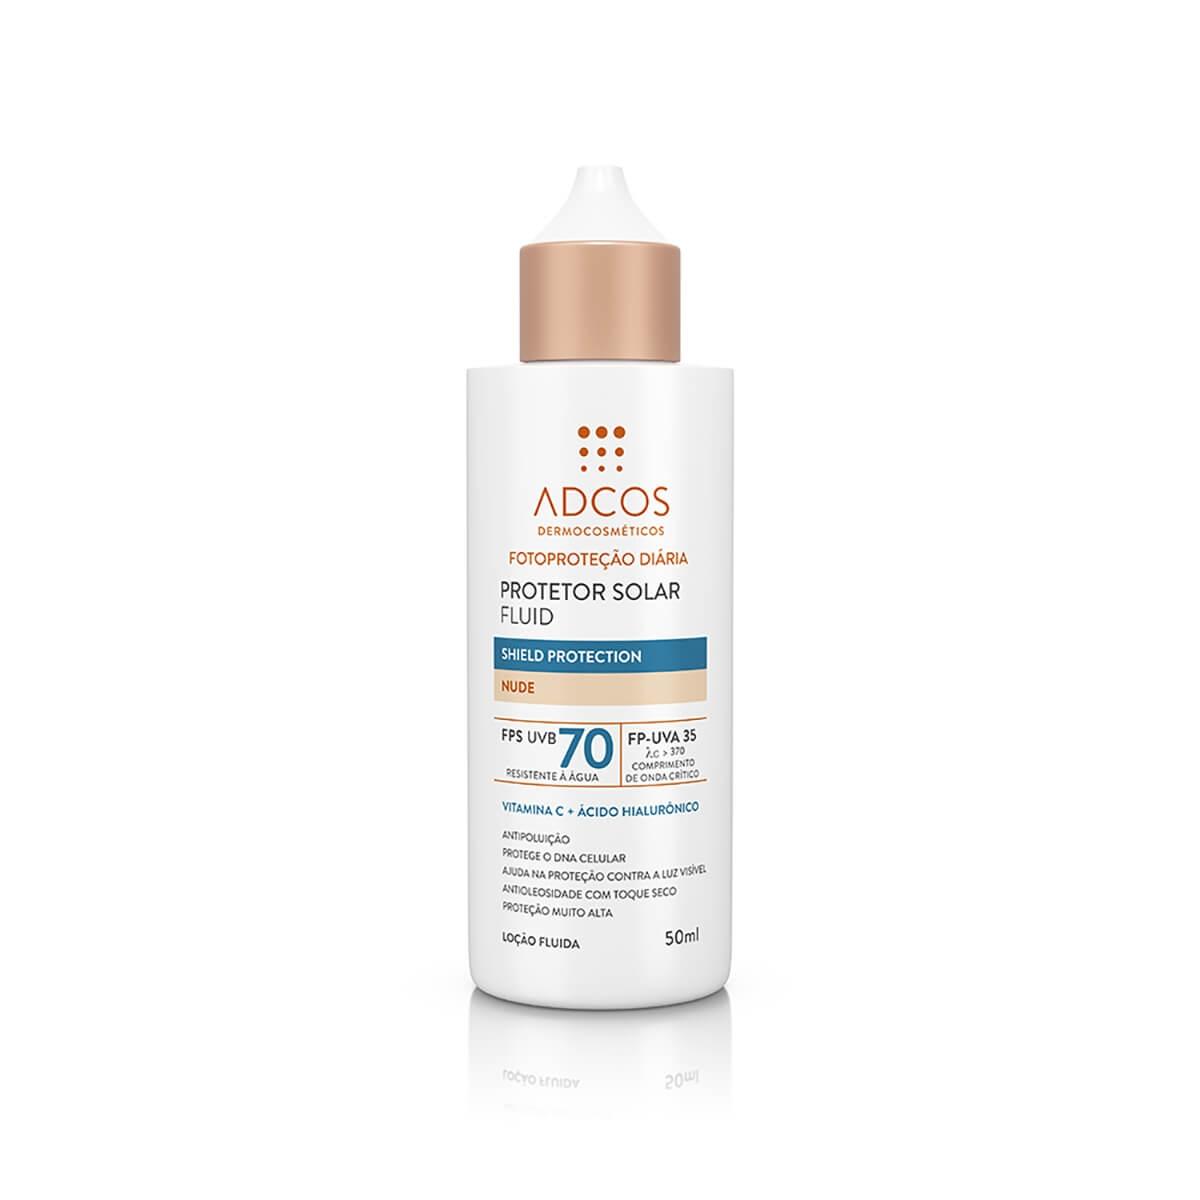 Protetor Solar Fluid Adcos Shield Protection Nude FPS70 50ml